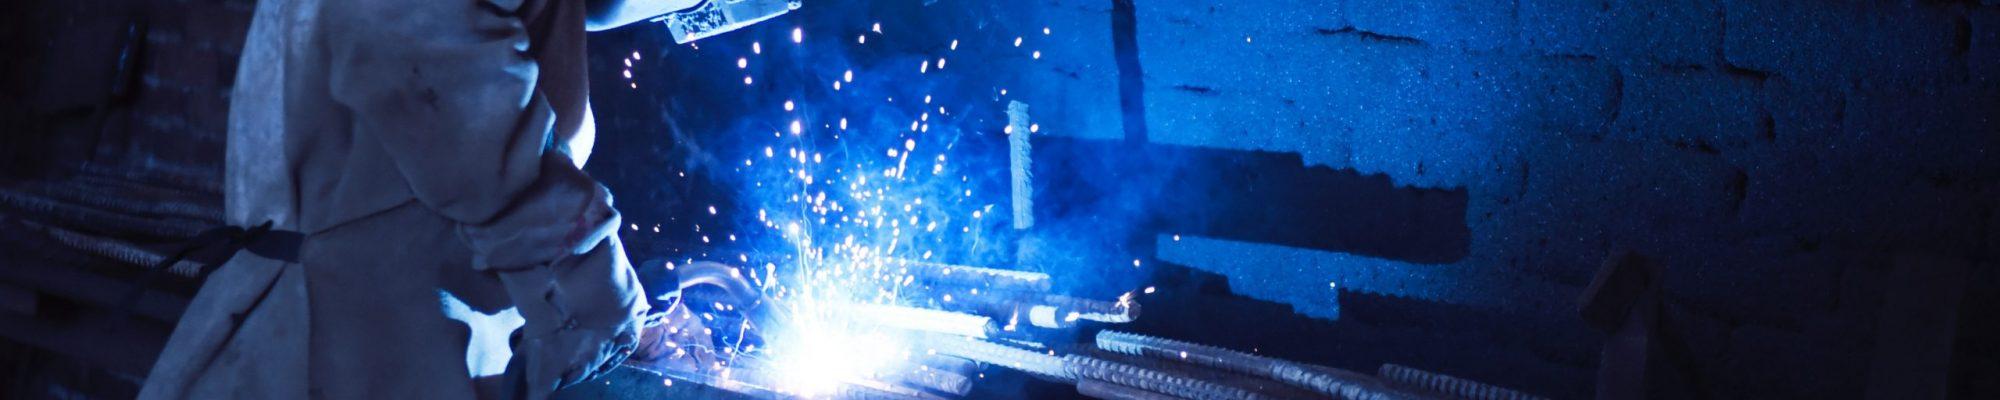 man-wearing-welding-helmet-welding-metal-near-gray-brick-1474993